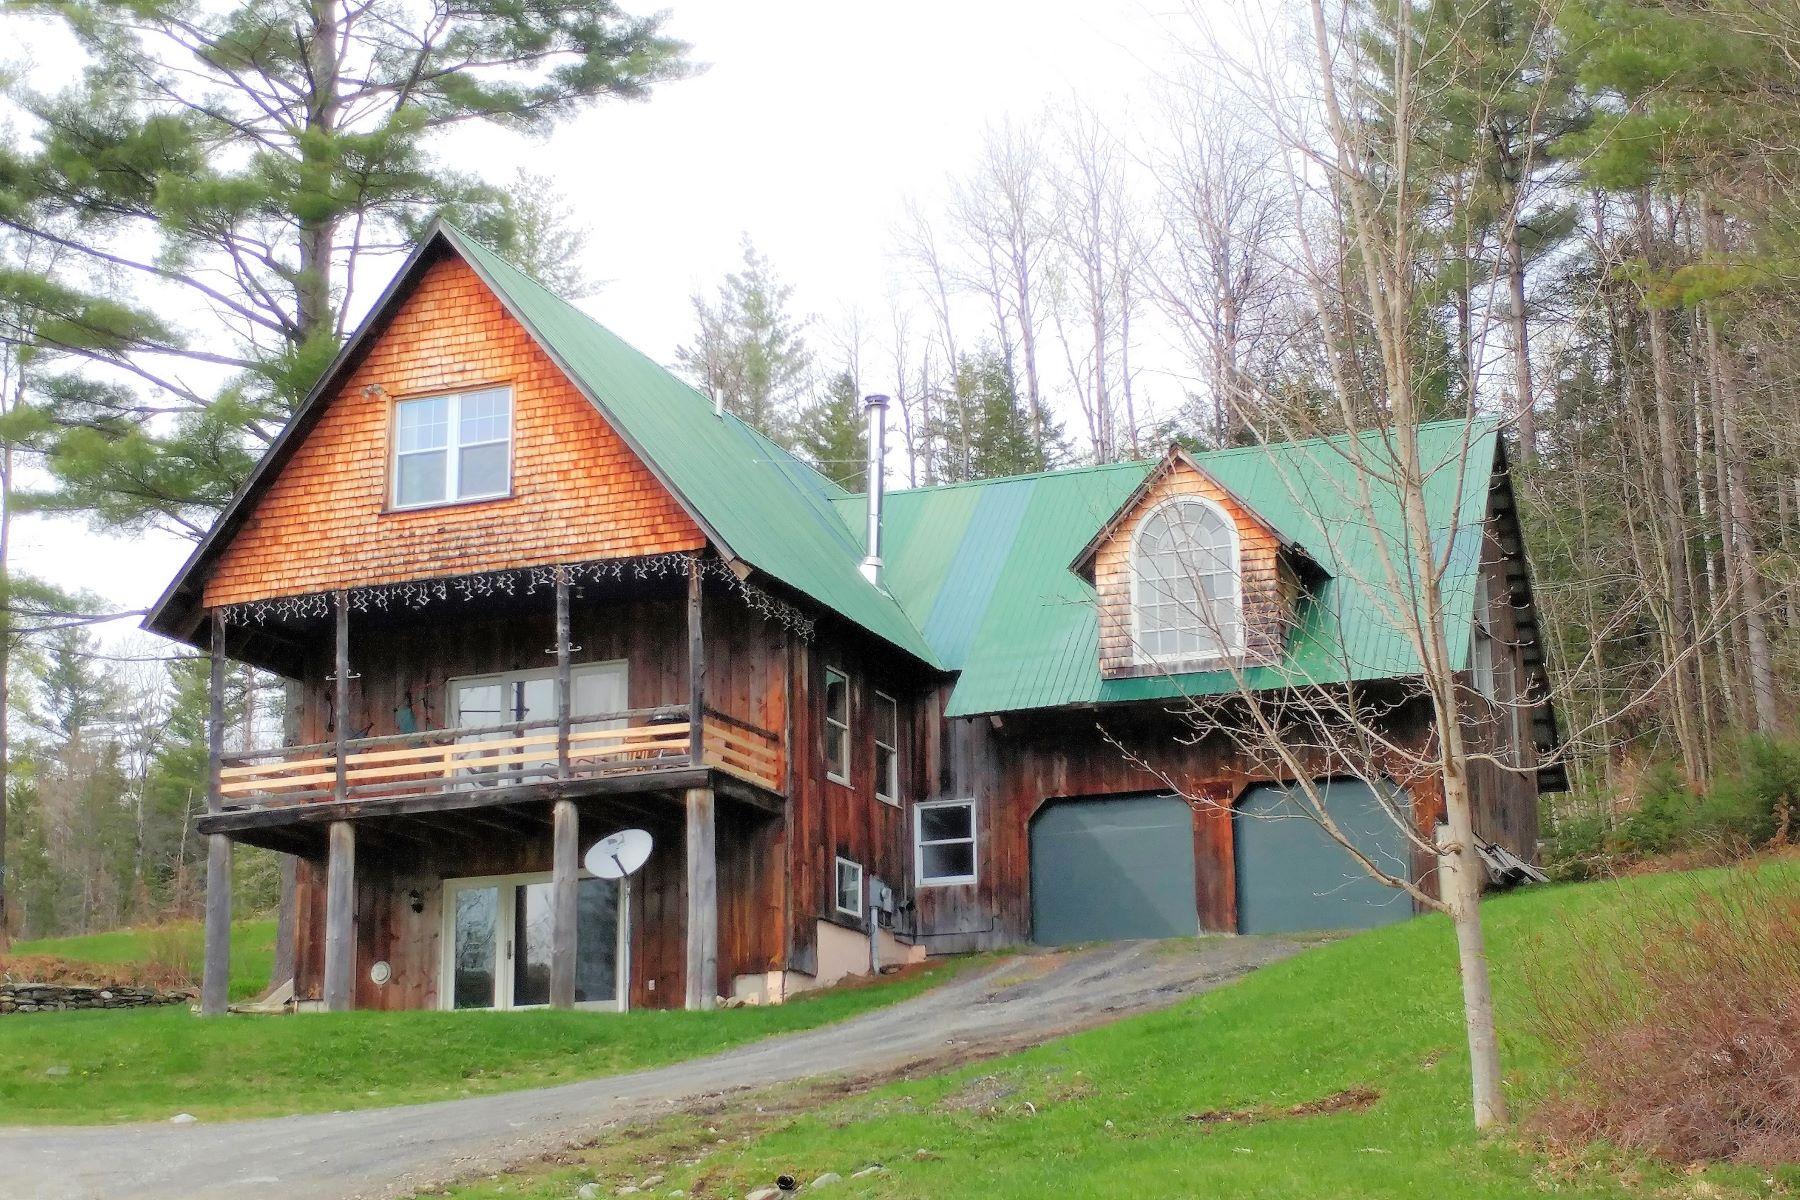 Moradia para Venda às Peace and Quiet with Views in Northfield 2406 Stony Brook Rd Northfield, Vermont, 05663 Estados Unidos